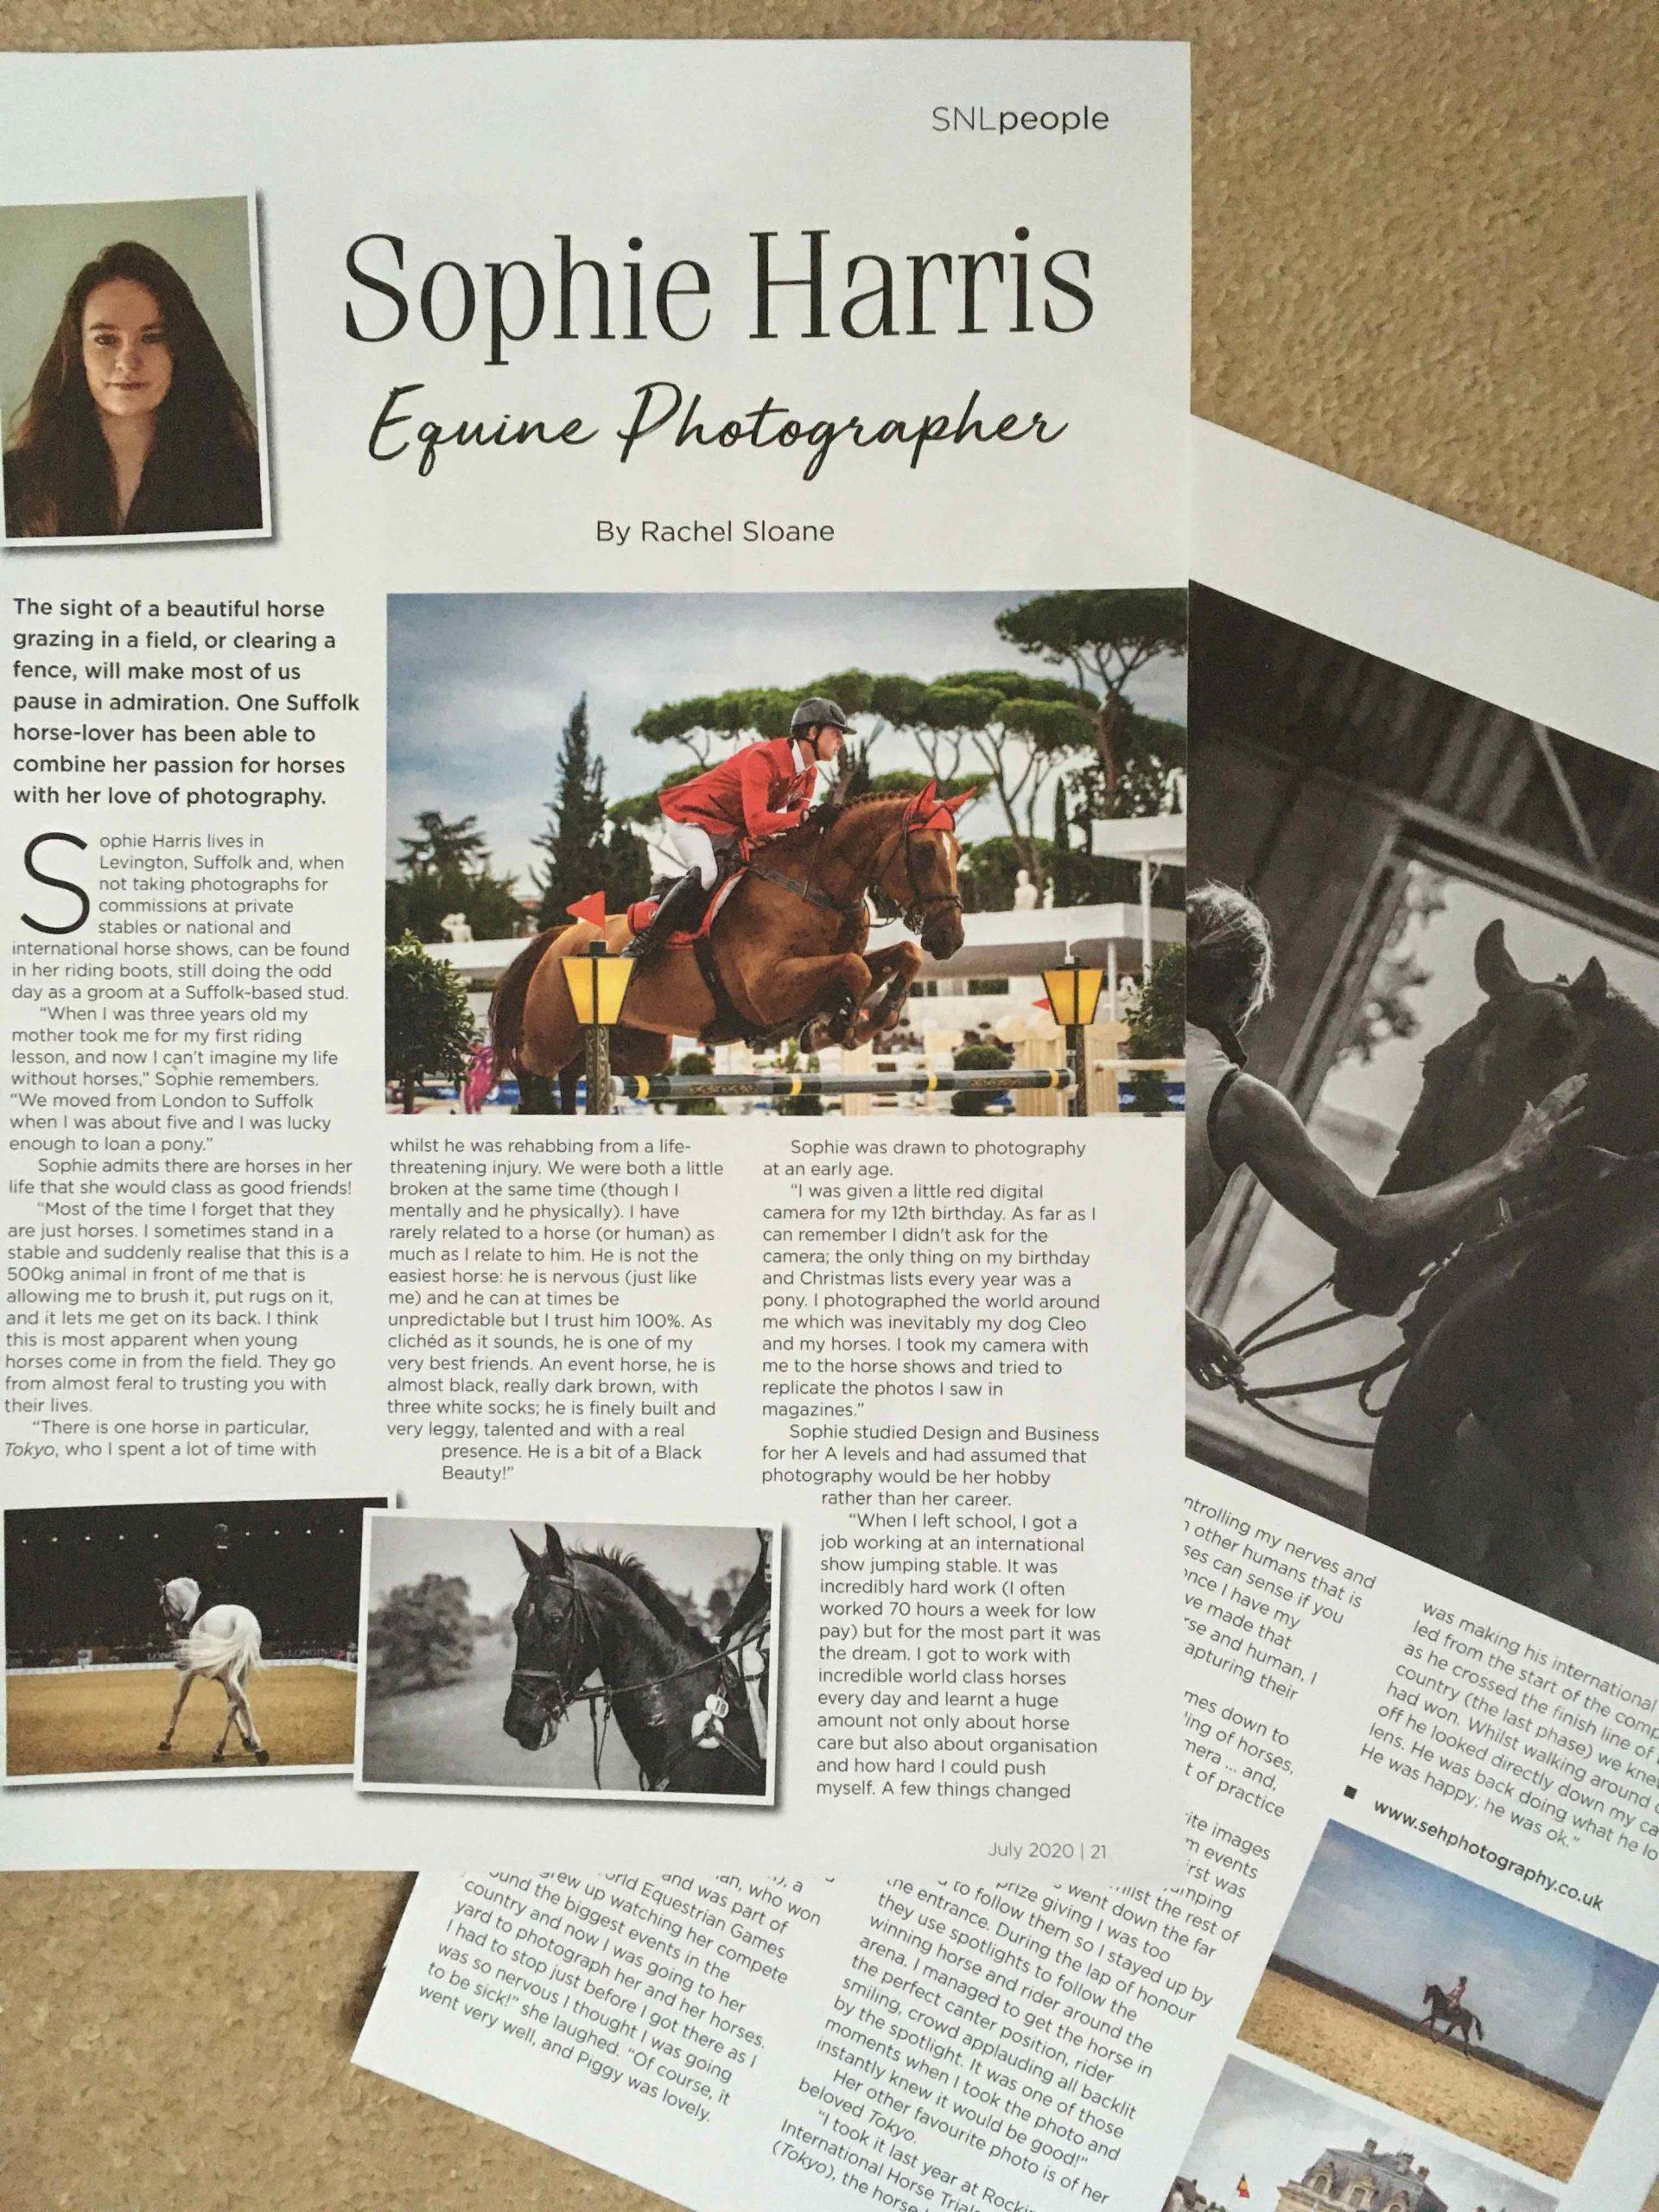 SNLEquine photgrapher, Sophie Harris